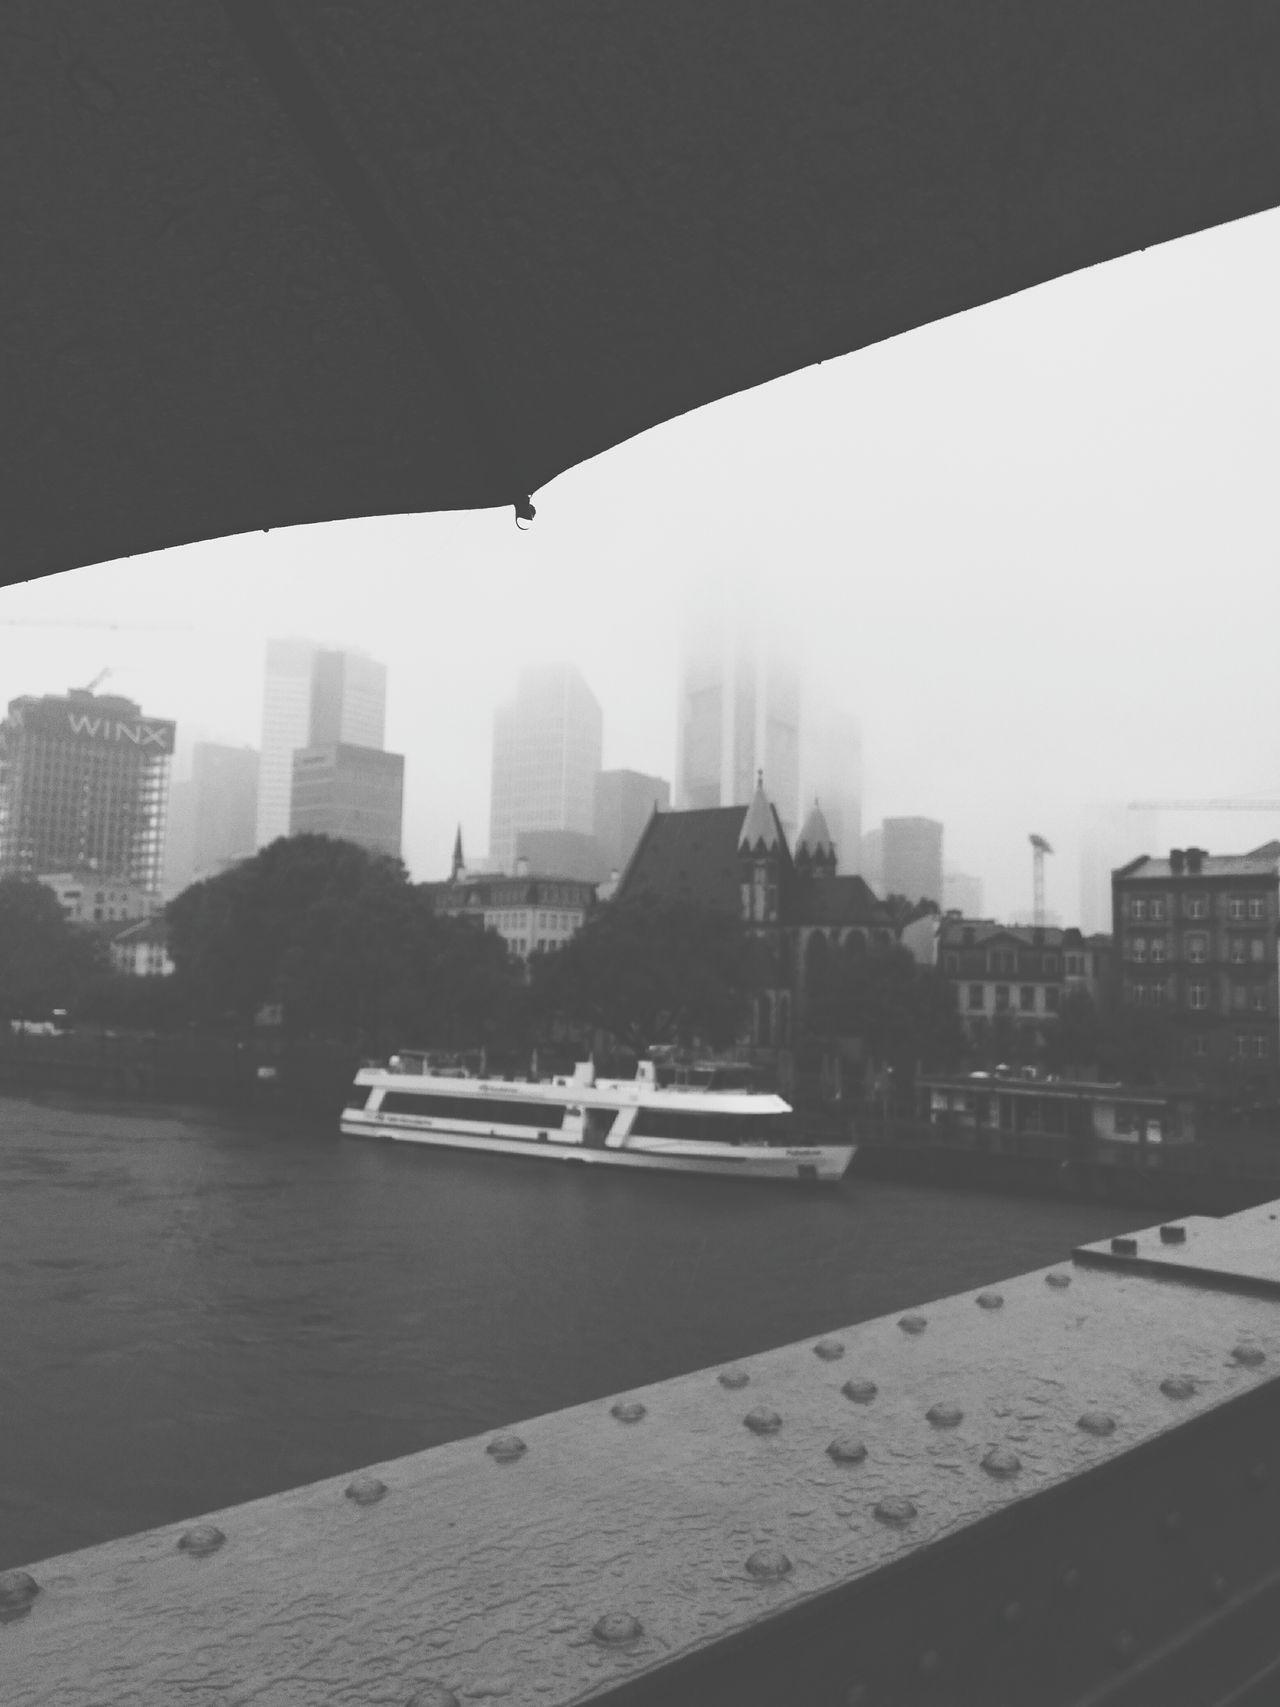 City Cityscape Frankfurt Am Main Foggy Raindrops Skyline Skyline Frankfurt Autumn Umbrella Eiserner Steg Main River